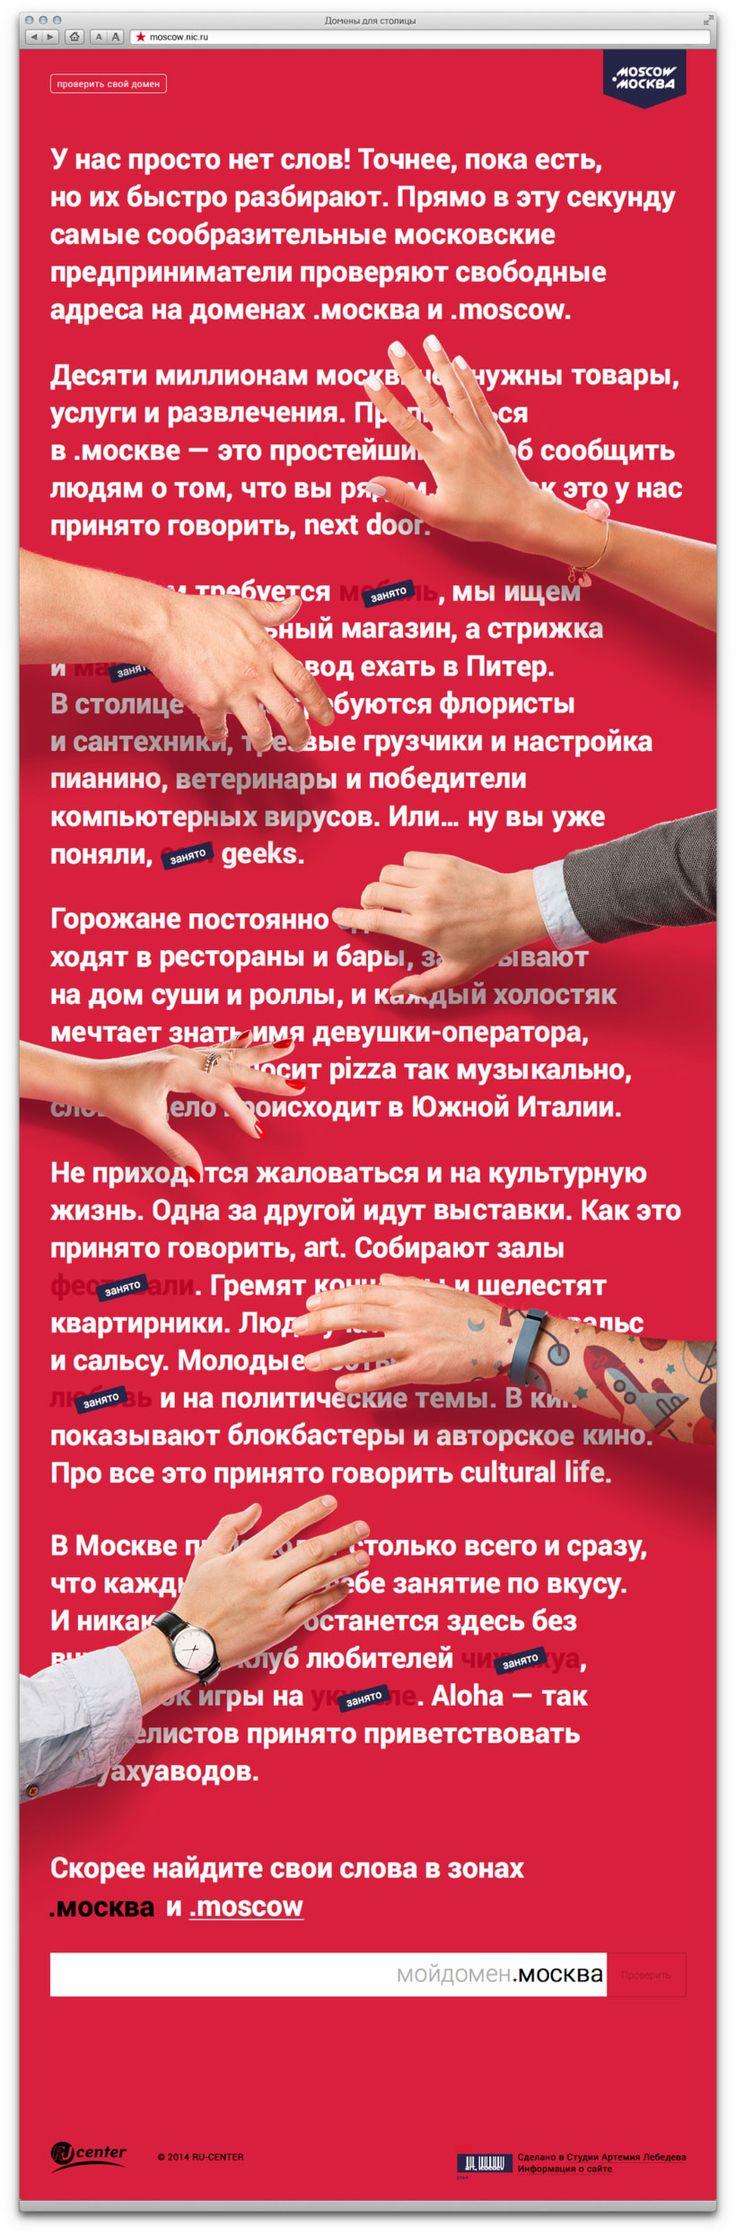 Промо-сайт доменных зон .москва и .moscow 2.0